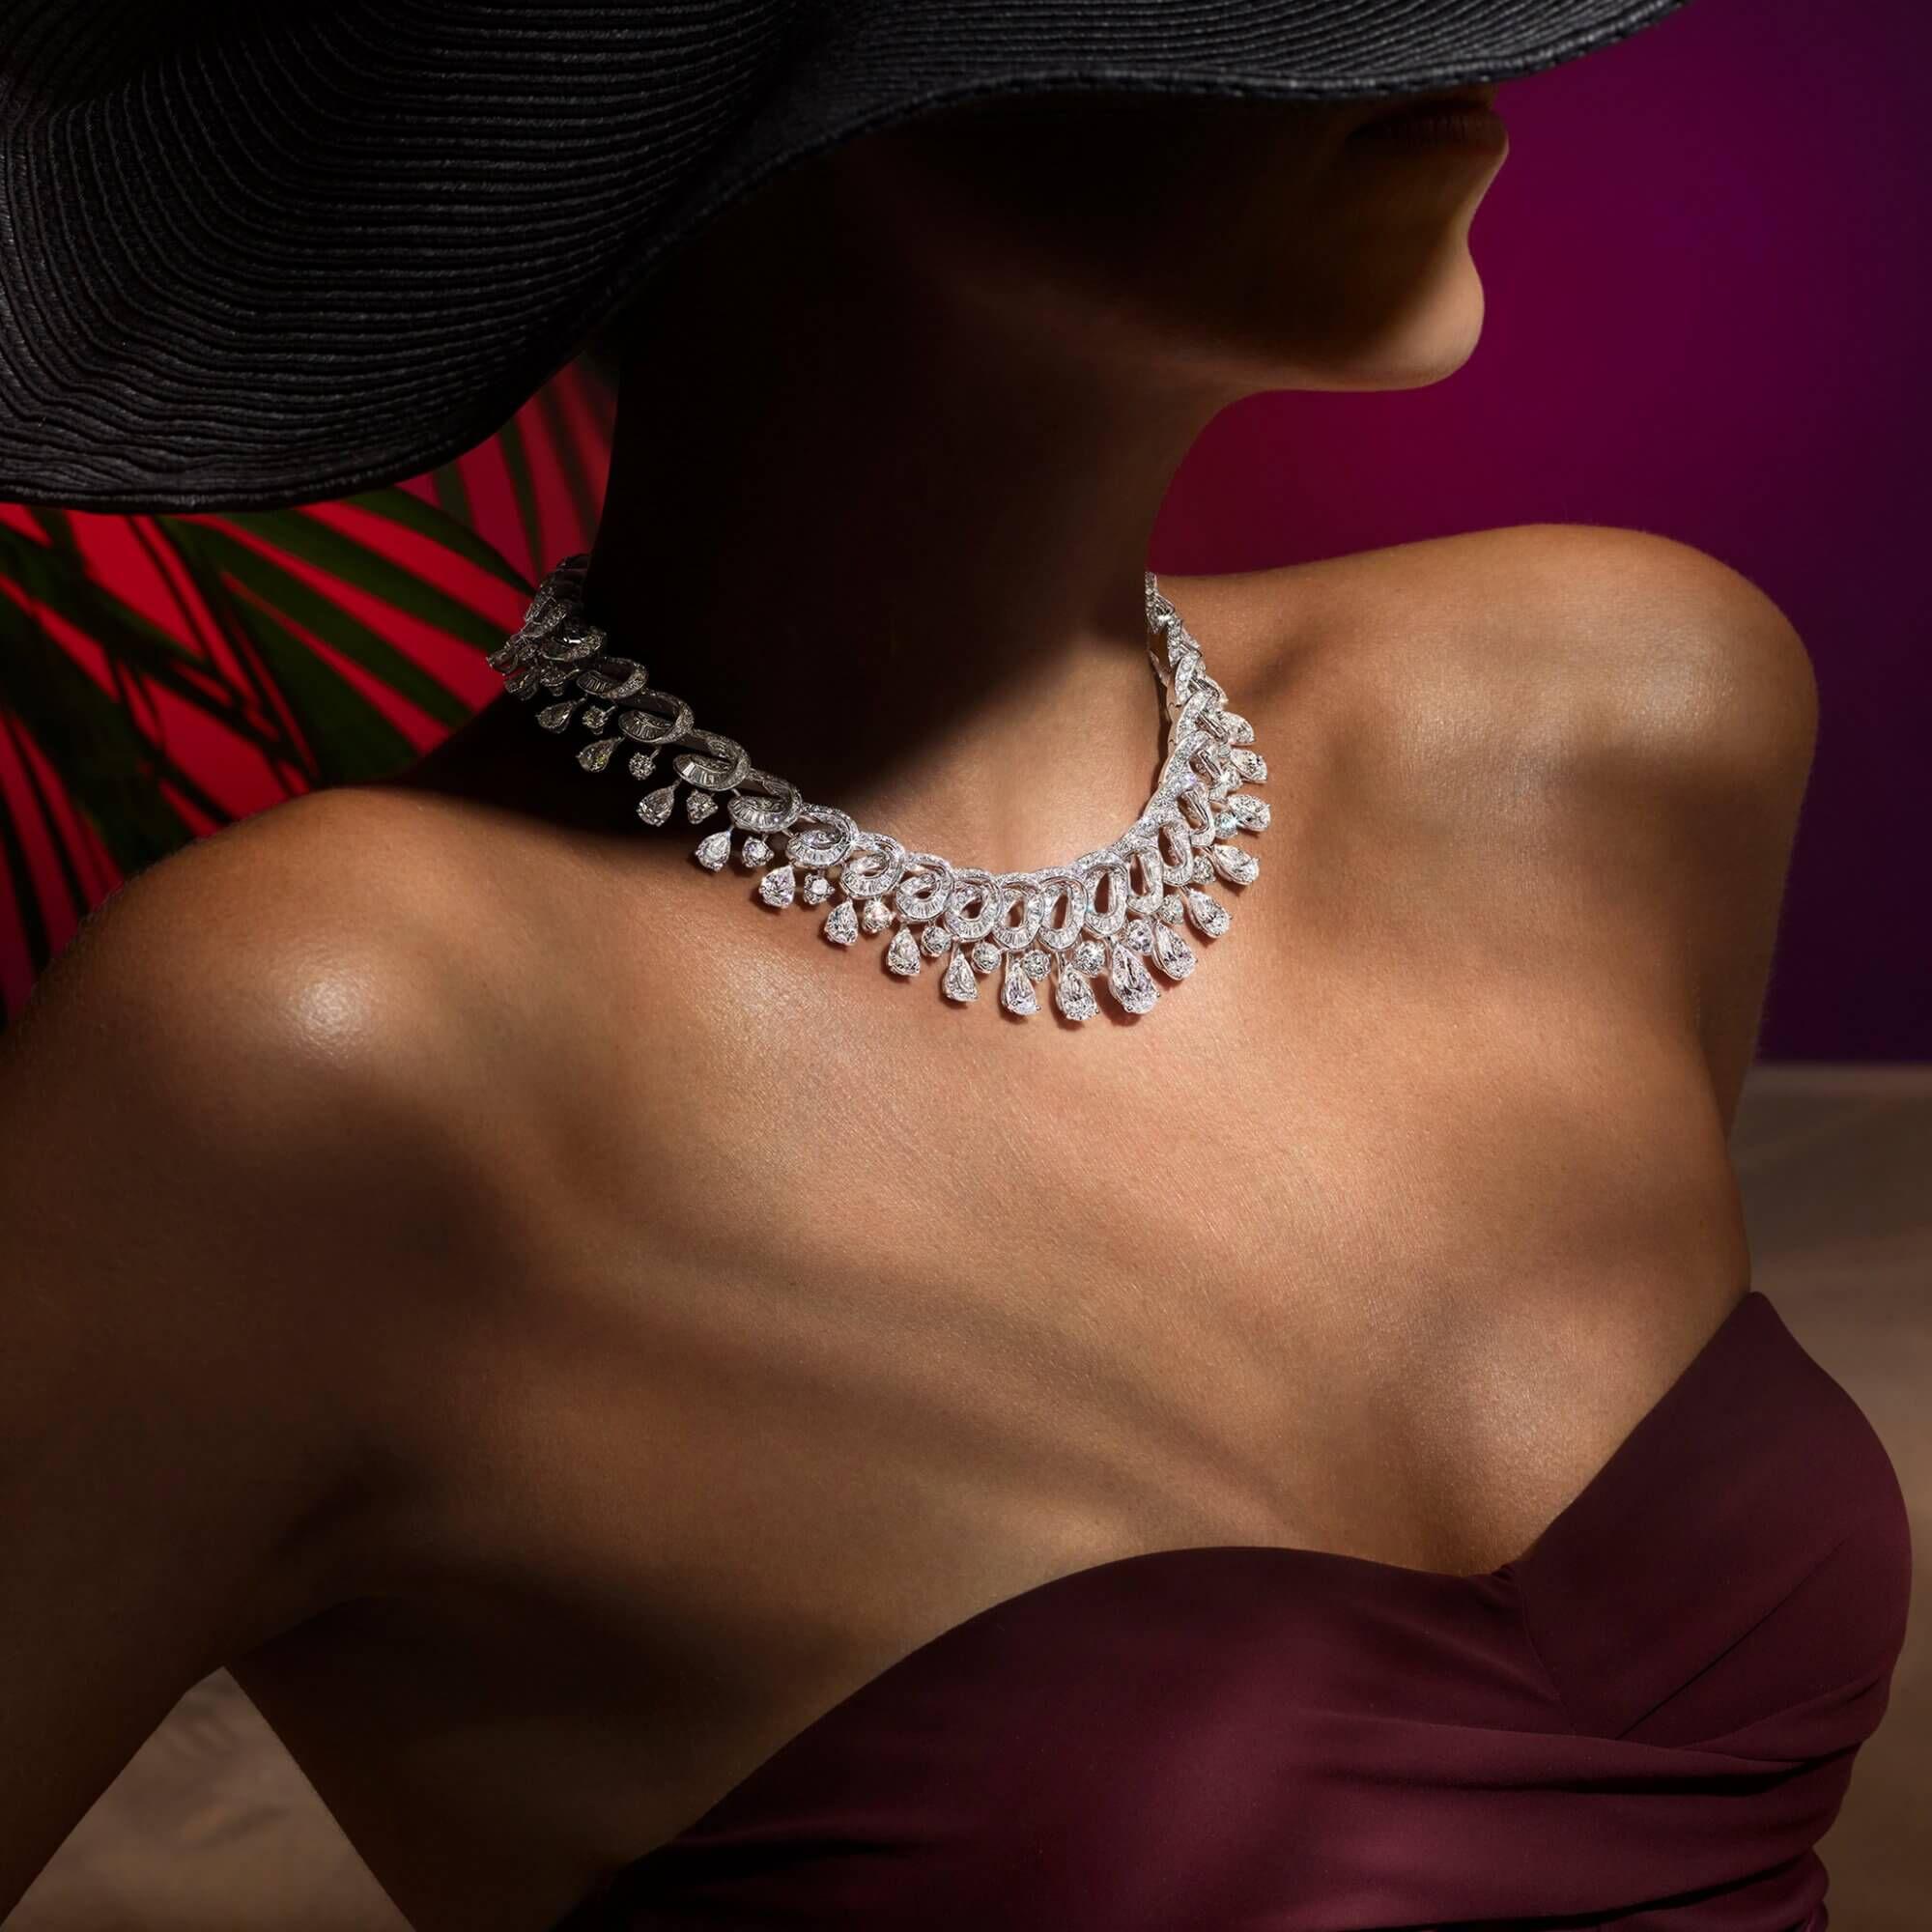 A model wears a Graff high jewellery diamond necklace